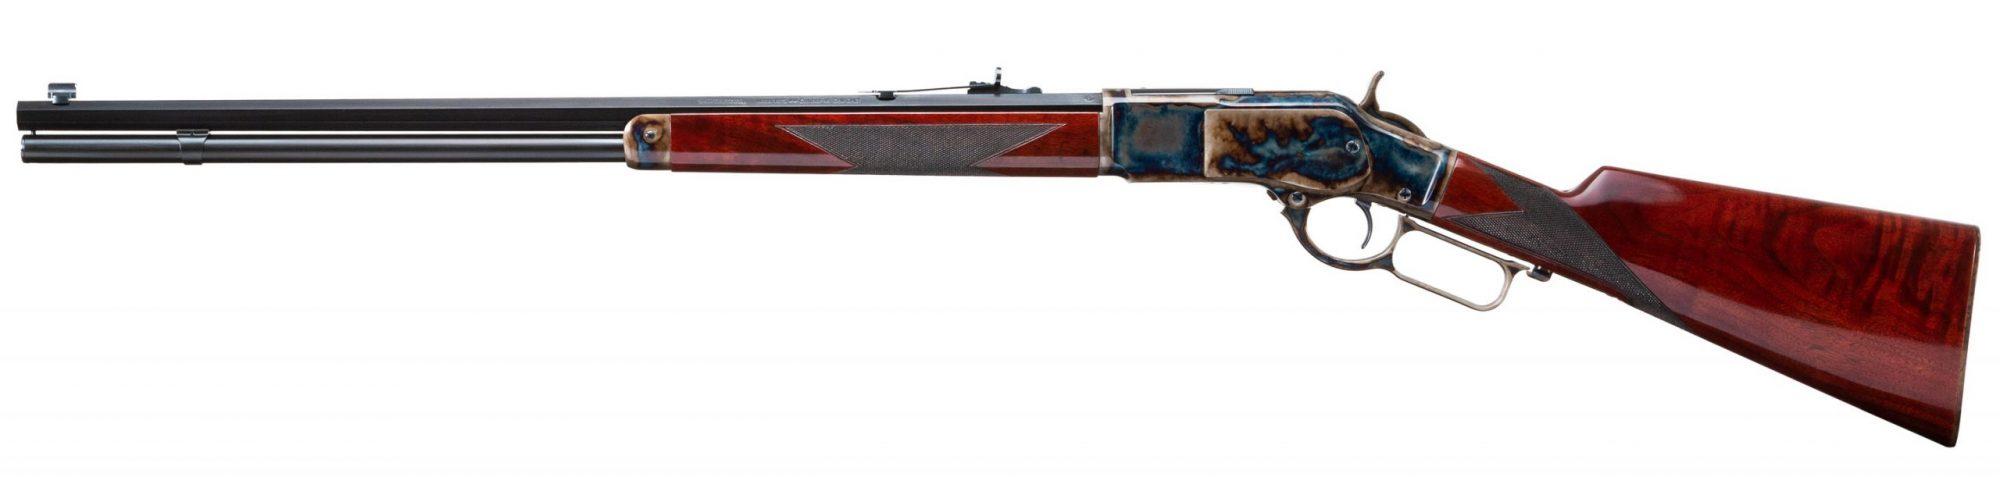 6539 Turnbull Winchester 1873 45 00103ZT73W